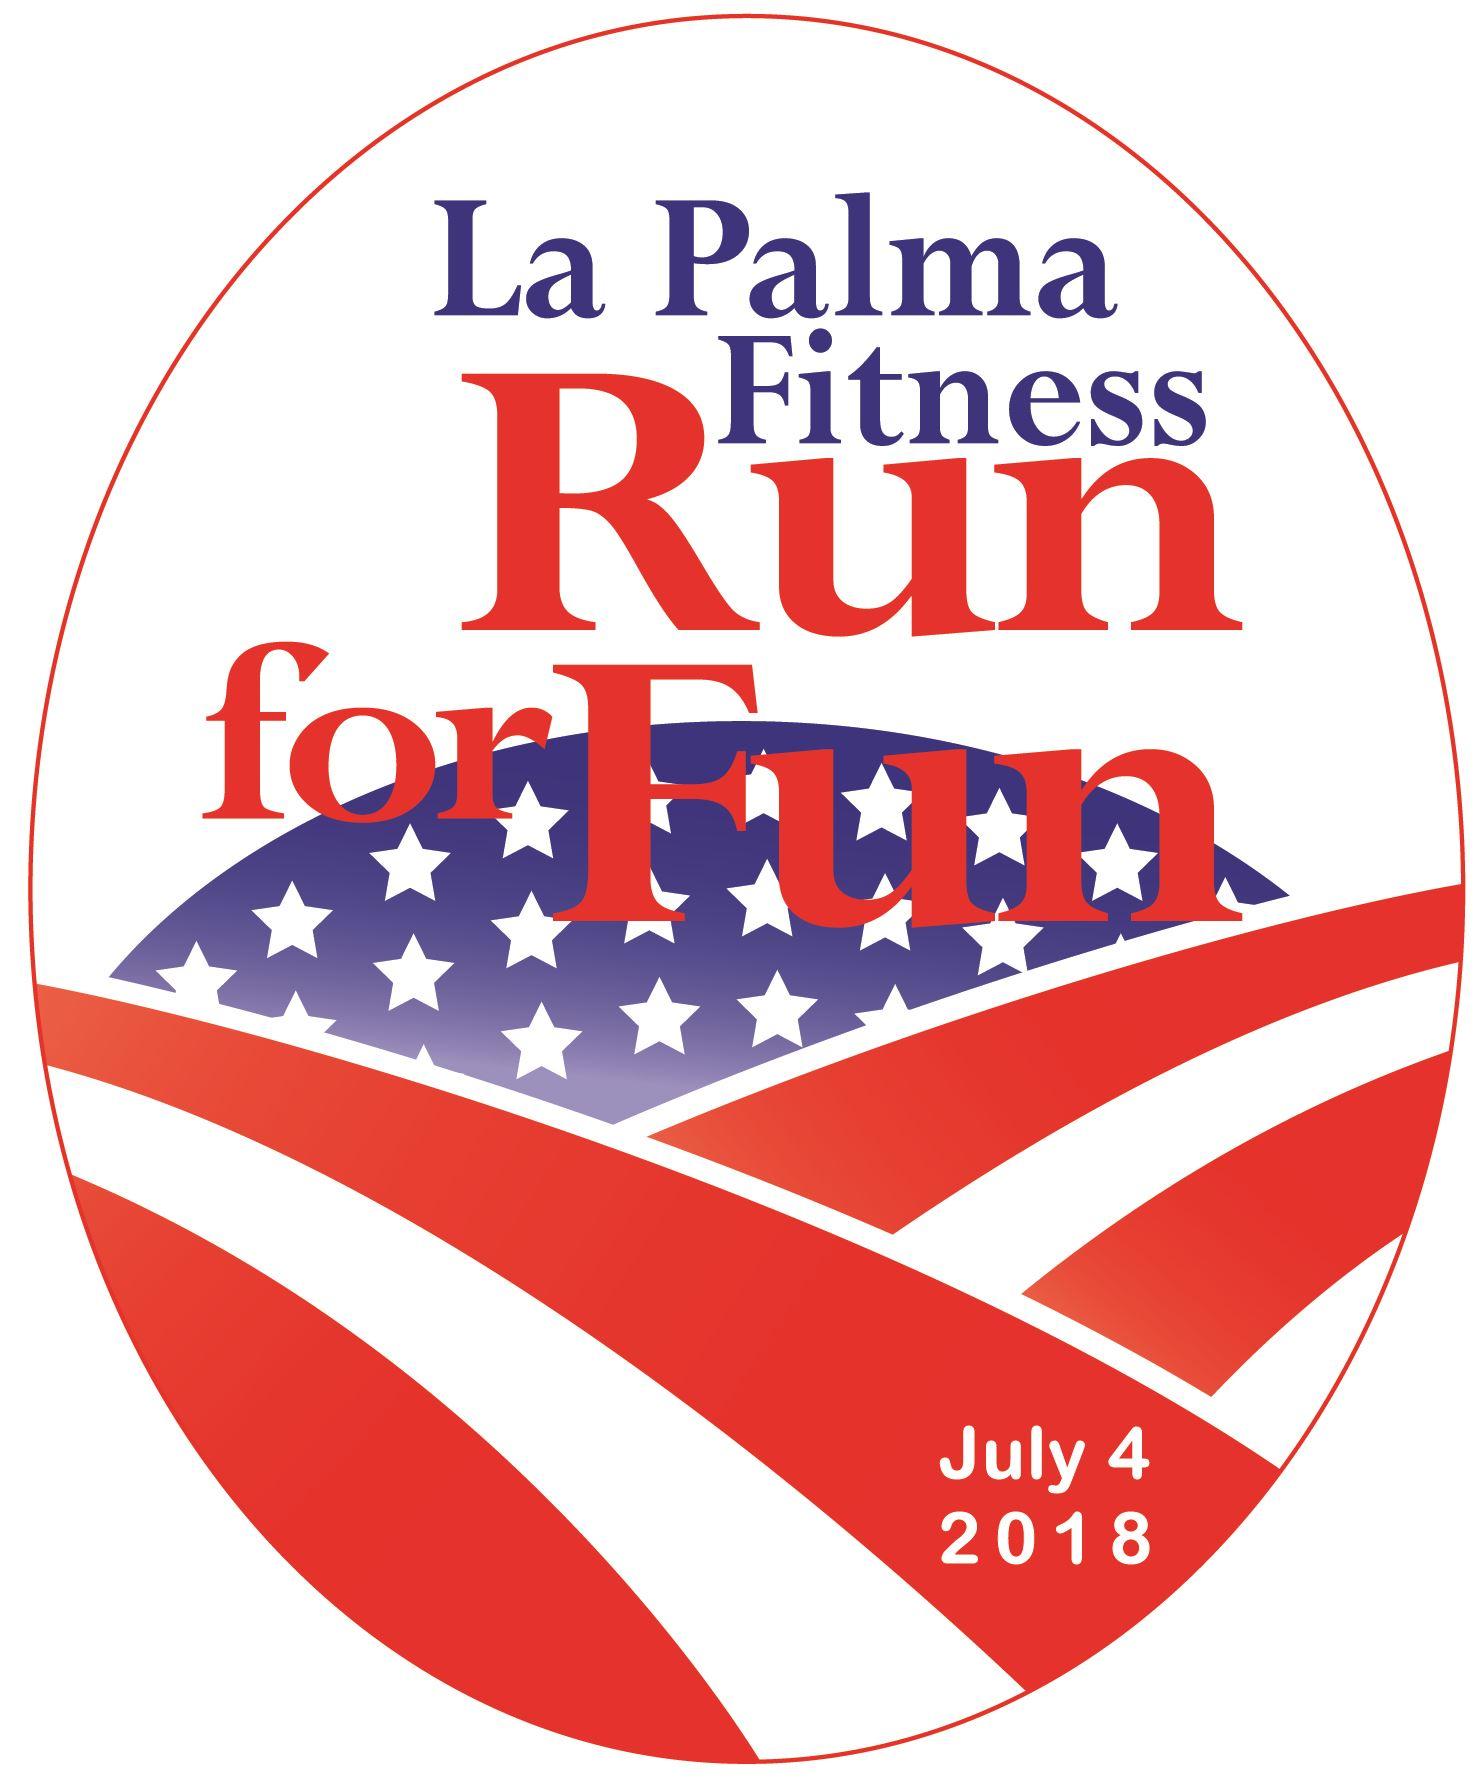 2018 Fitness Run For Fun La Palma Ca Official Website